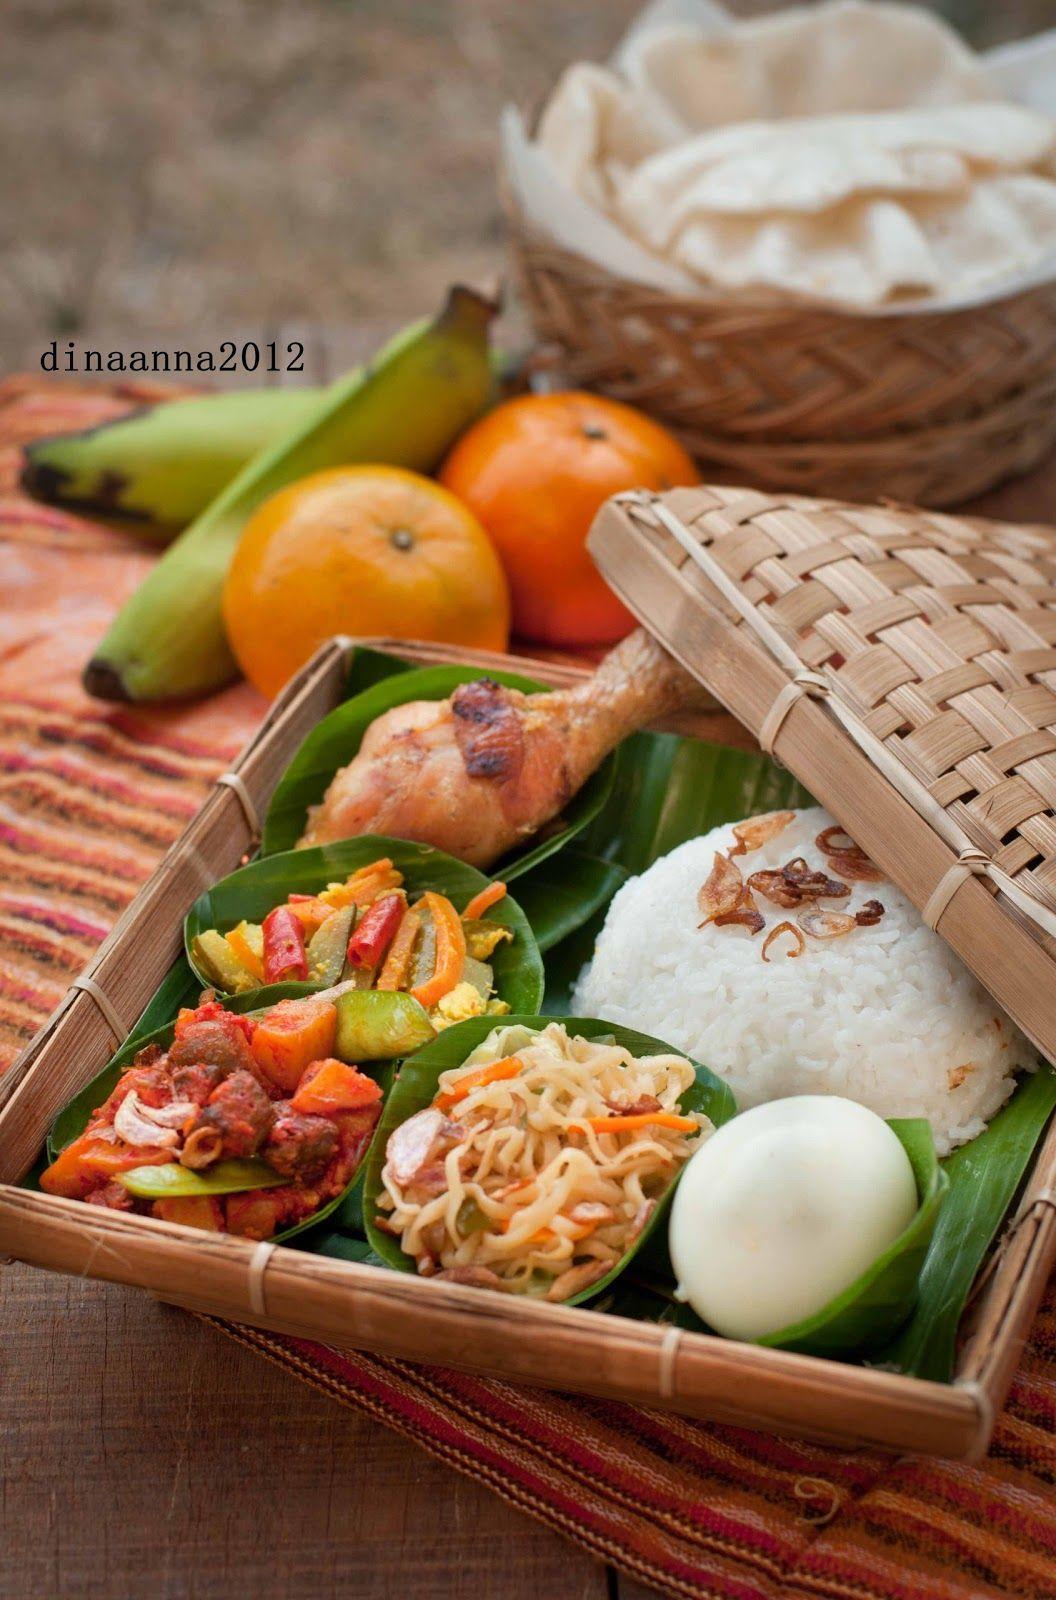 anniversary foodblogger celebrating indonesian